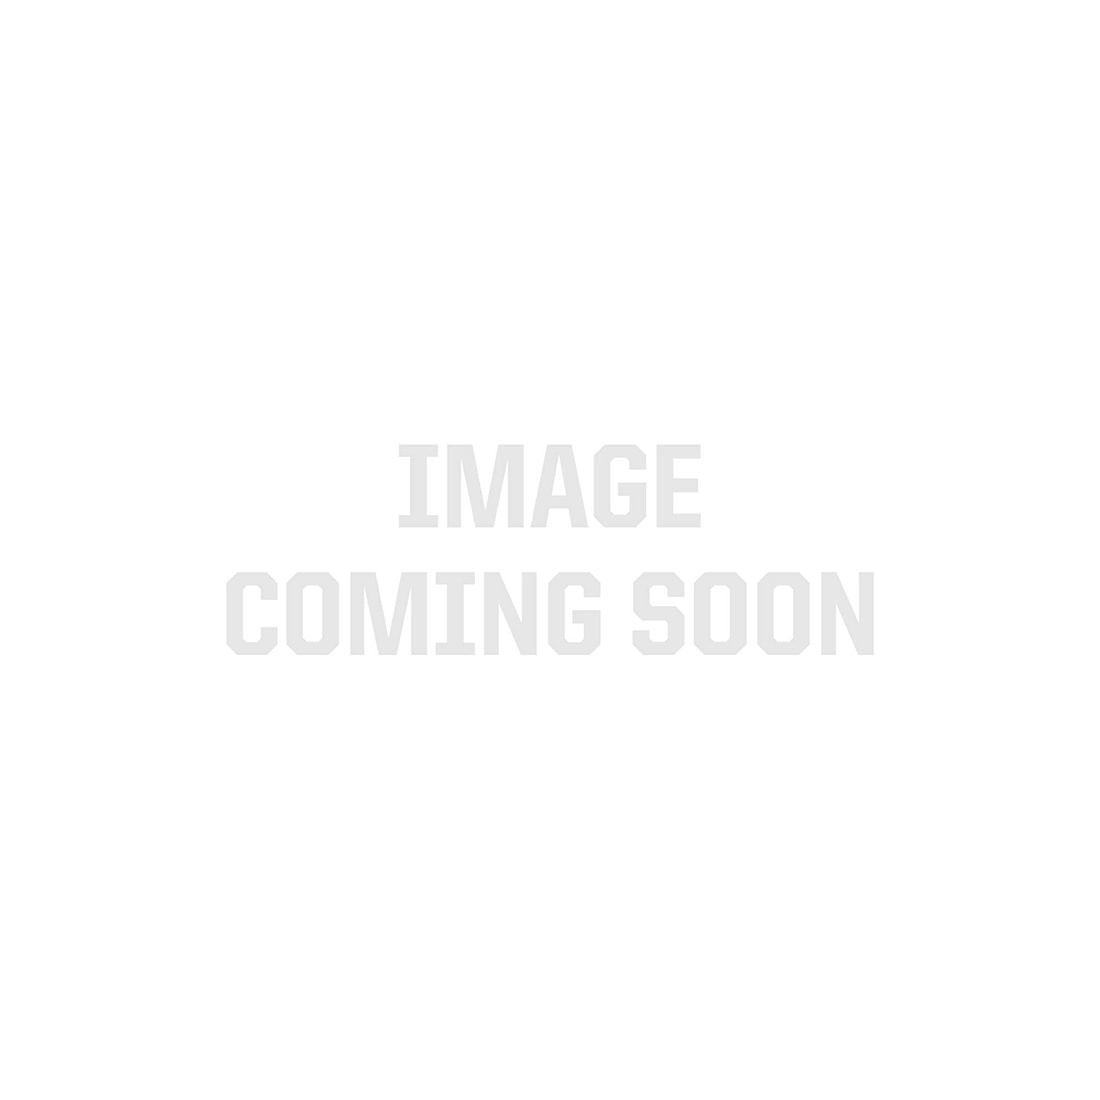 UltraSlim 2016 LED Strip Light - 3,000K - 120/m - Sample Kit